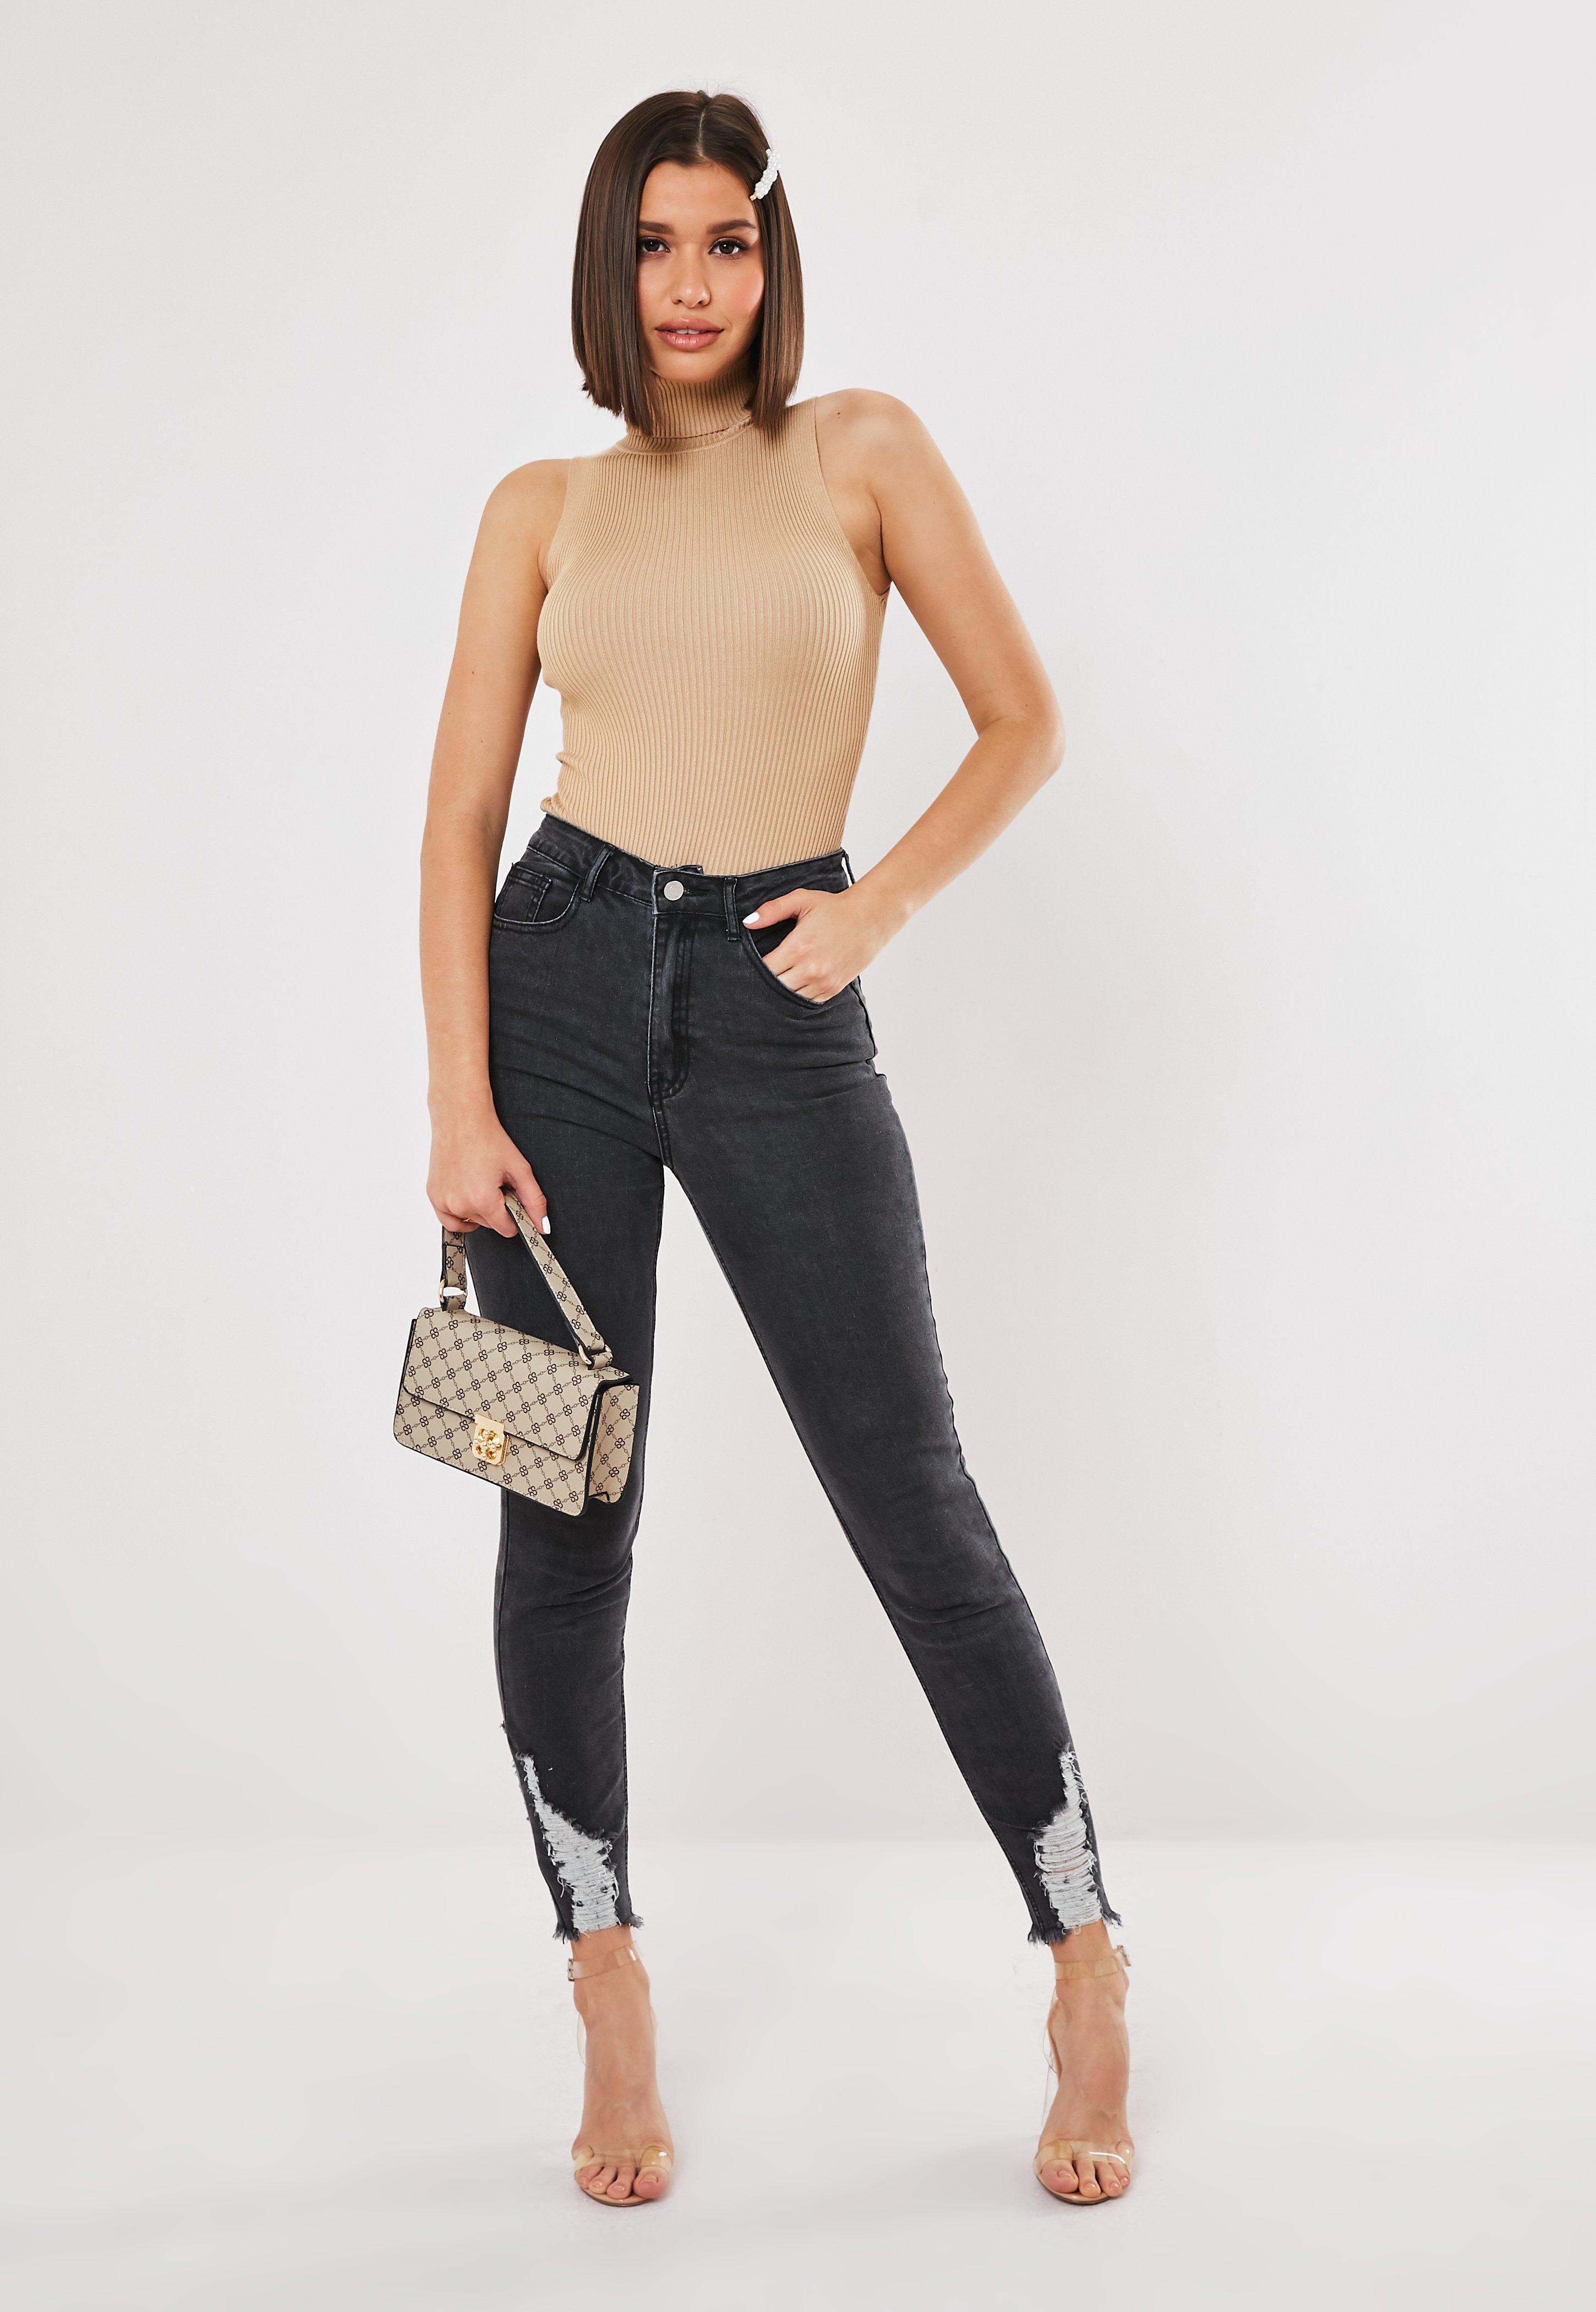 fdcf2b8fd332 Jeans | Women's Jeans - Missguided